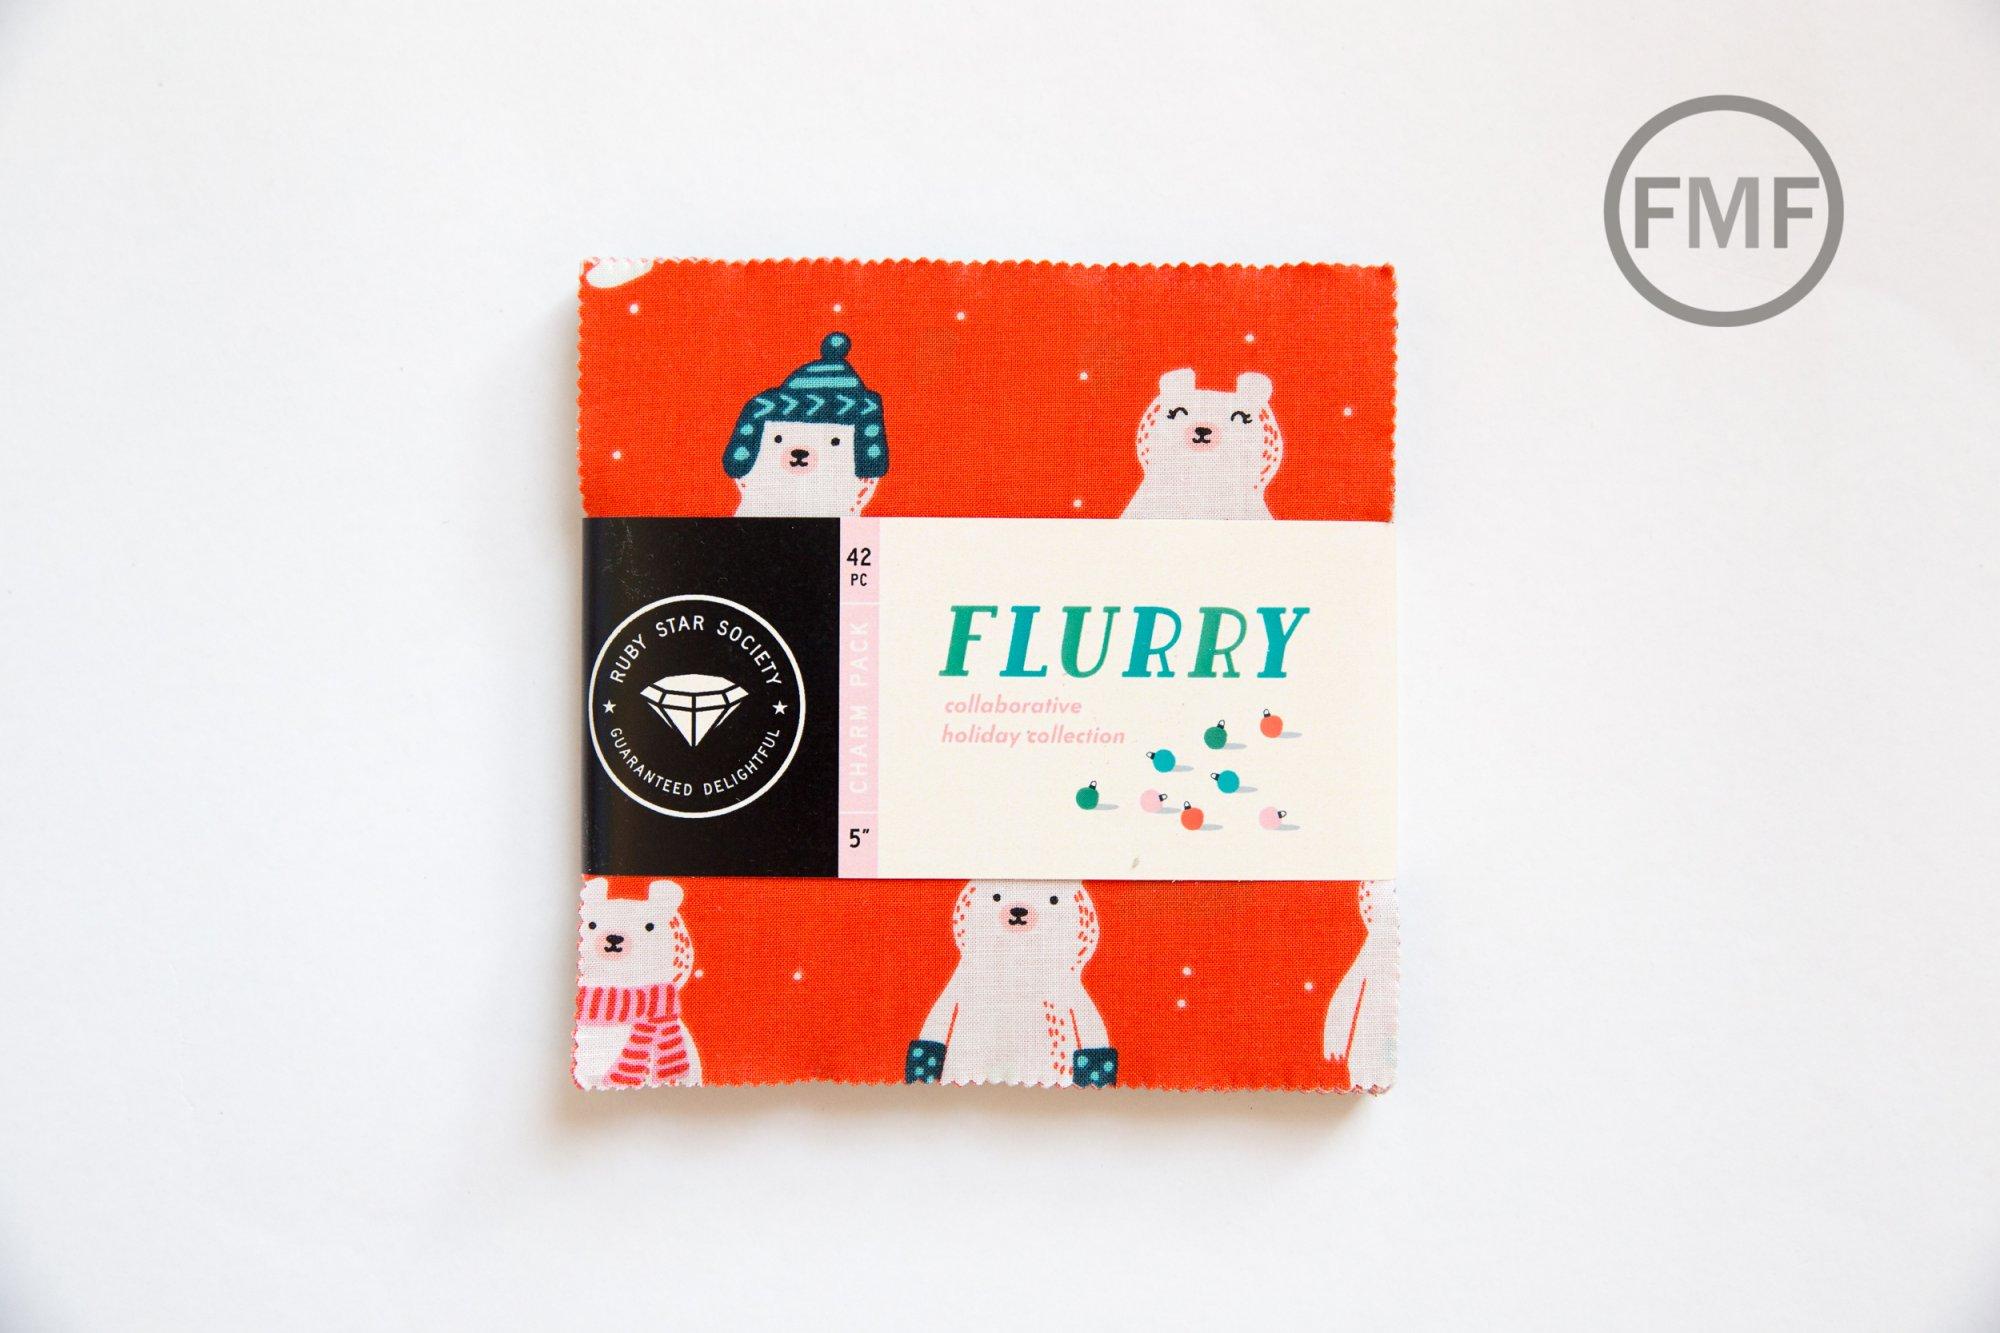 Flurry Charm Pack, Ruby Star Society